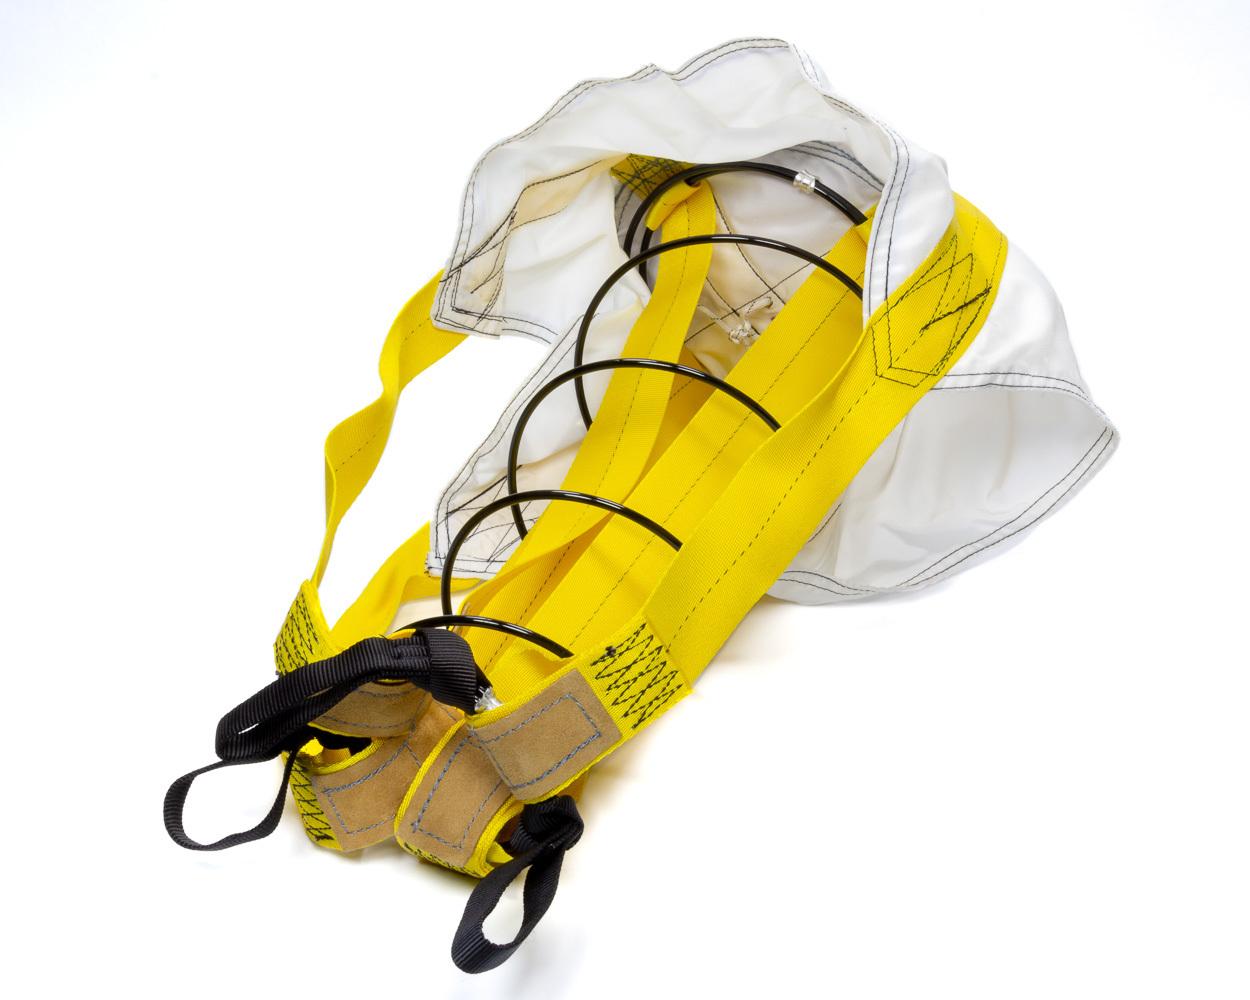 Deist Safety 31700 Drag Parachute Pilot, 7 in Diameter, Black, Each